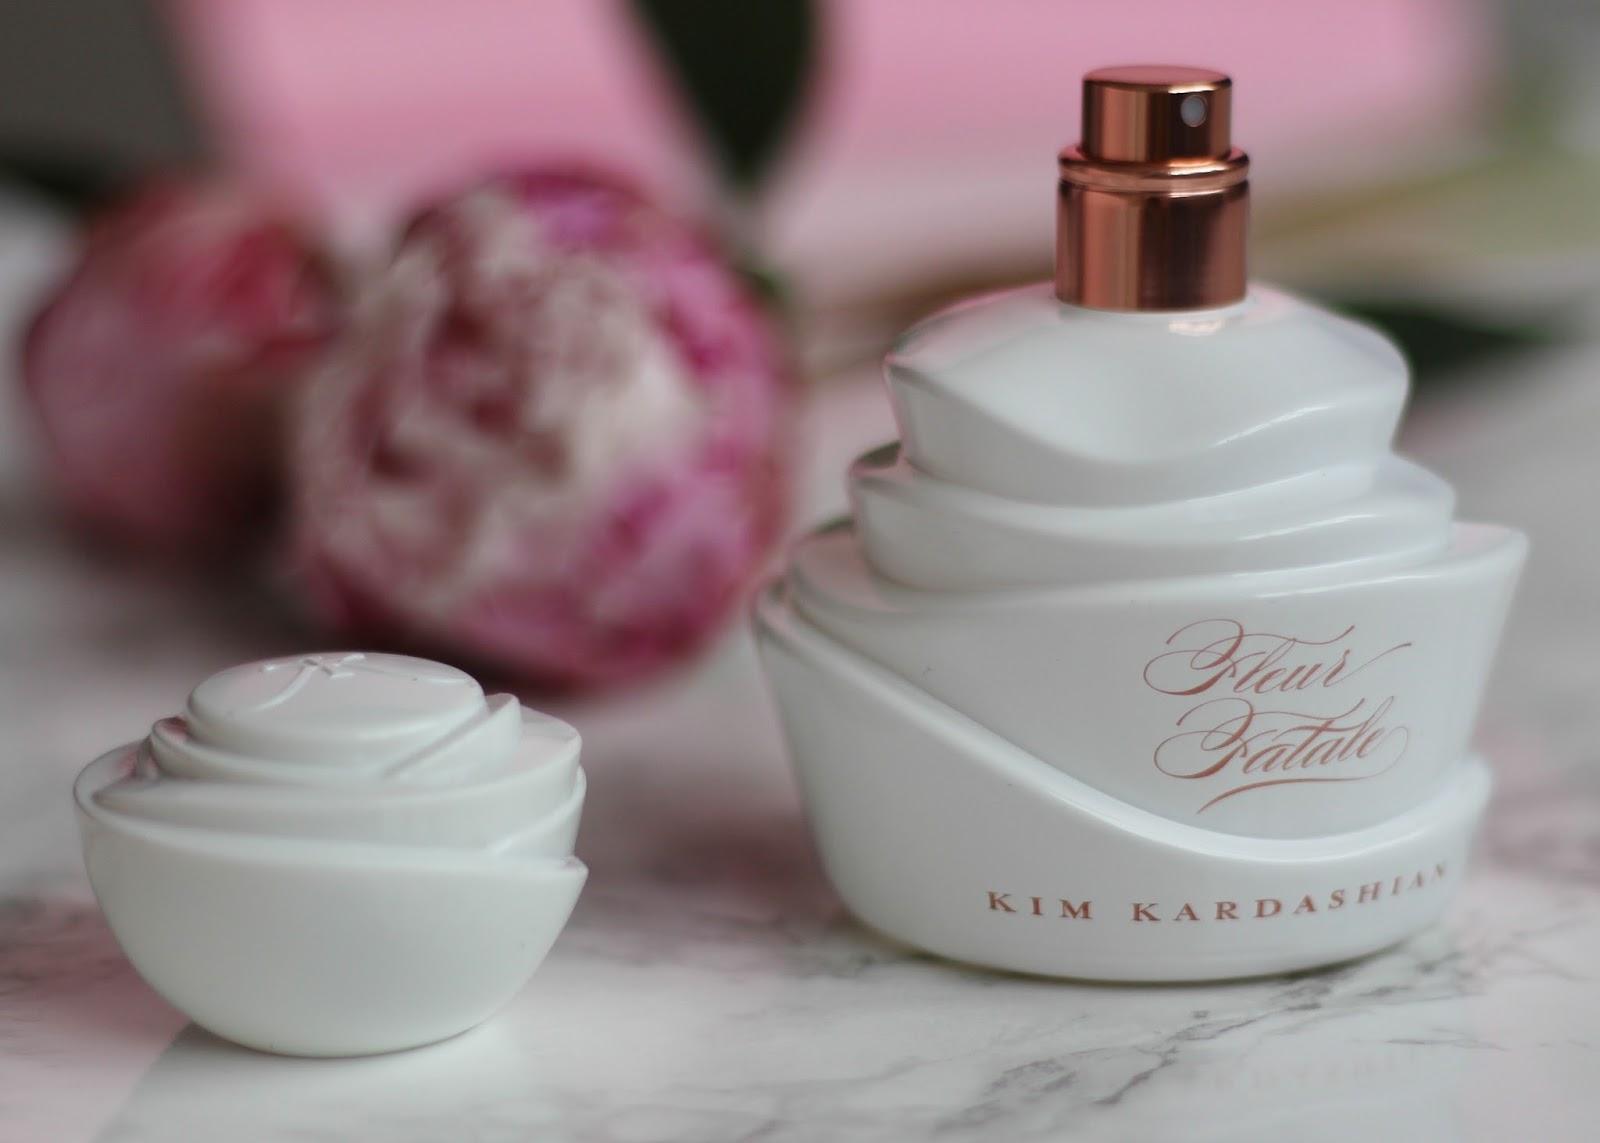 fleur fatale by kim kardashian fragrance review flutter